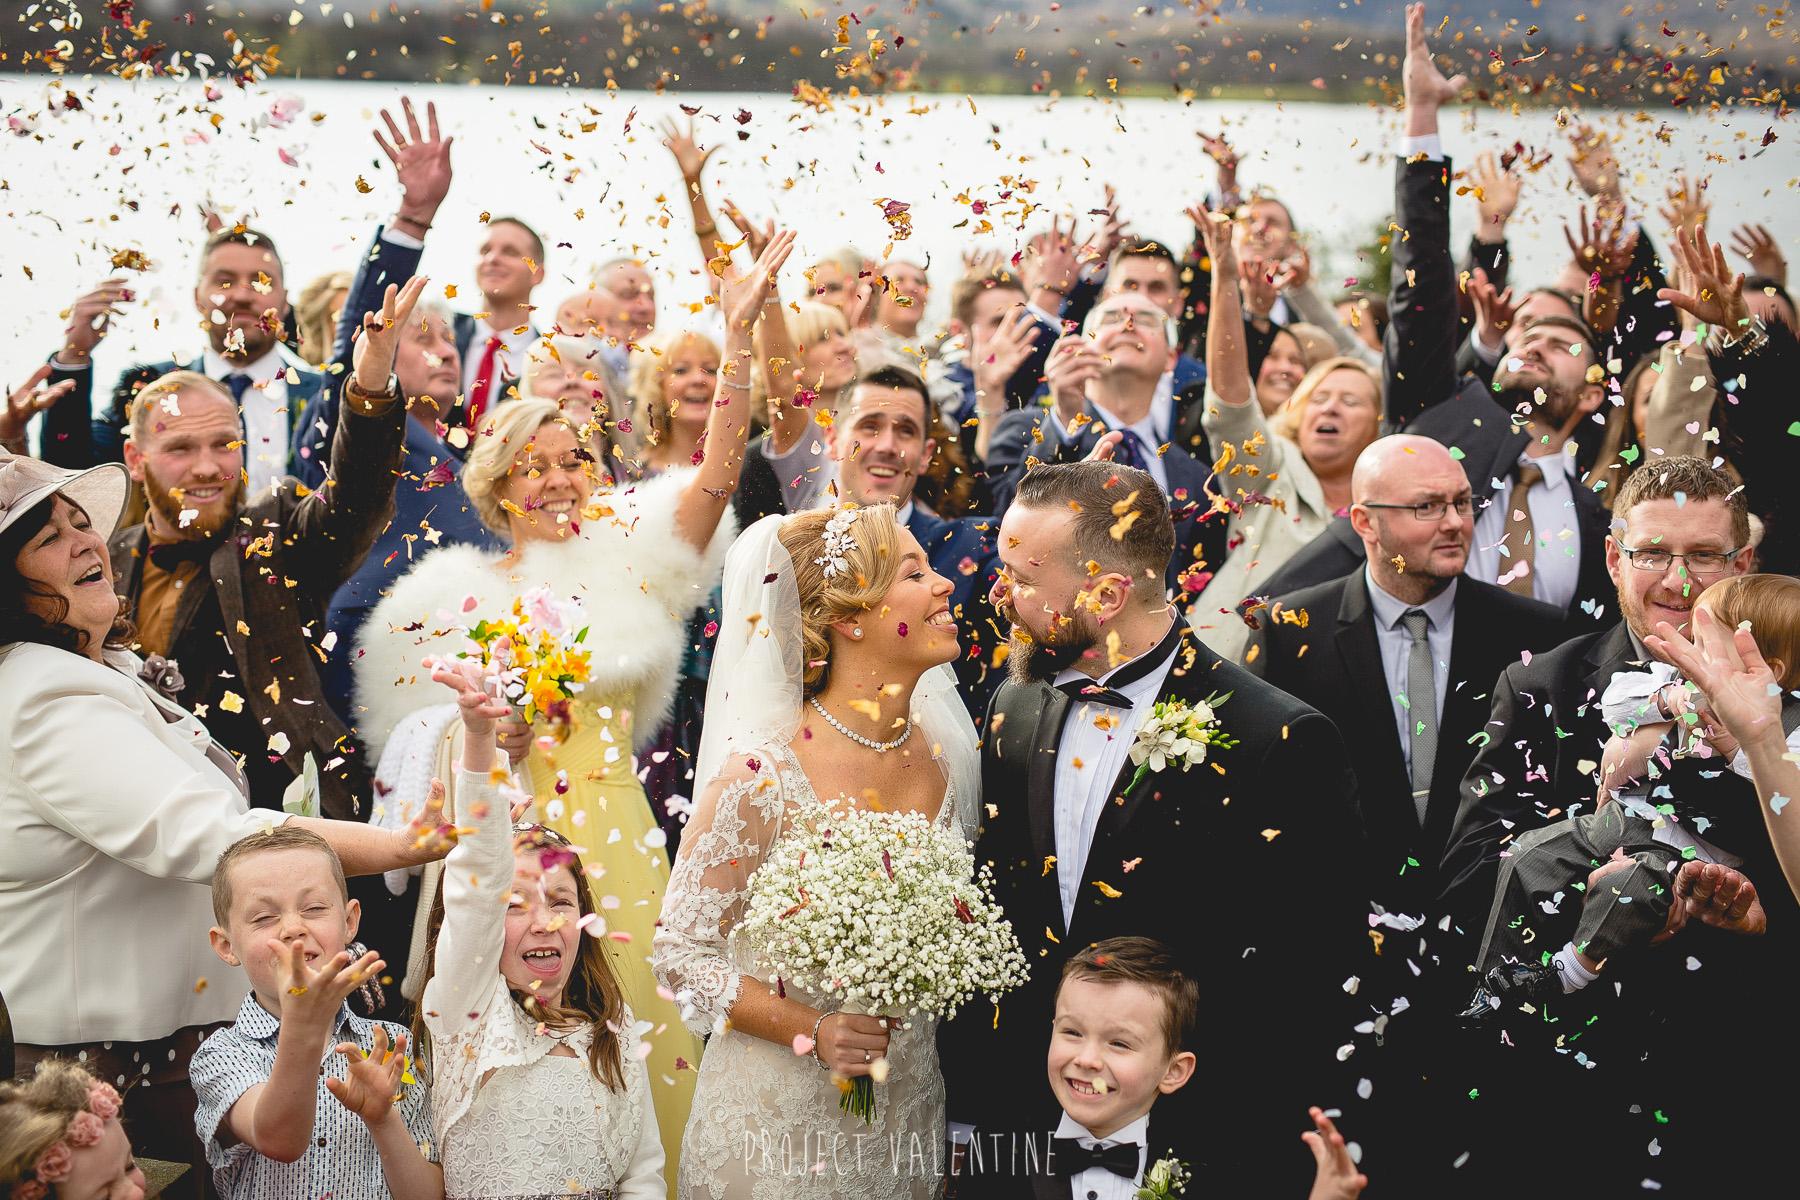 wedding guests throwing confetti